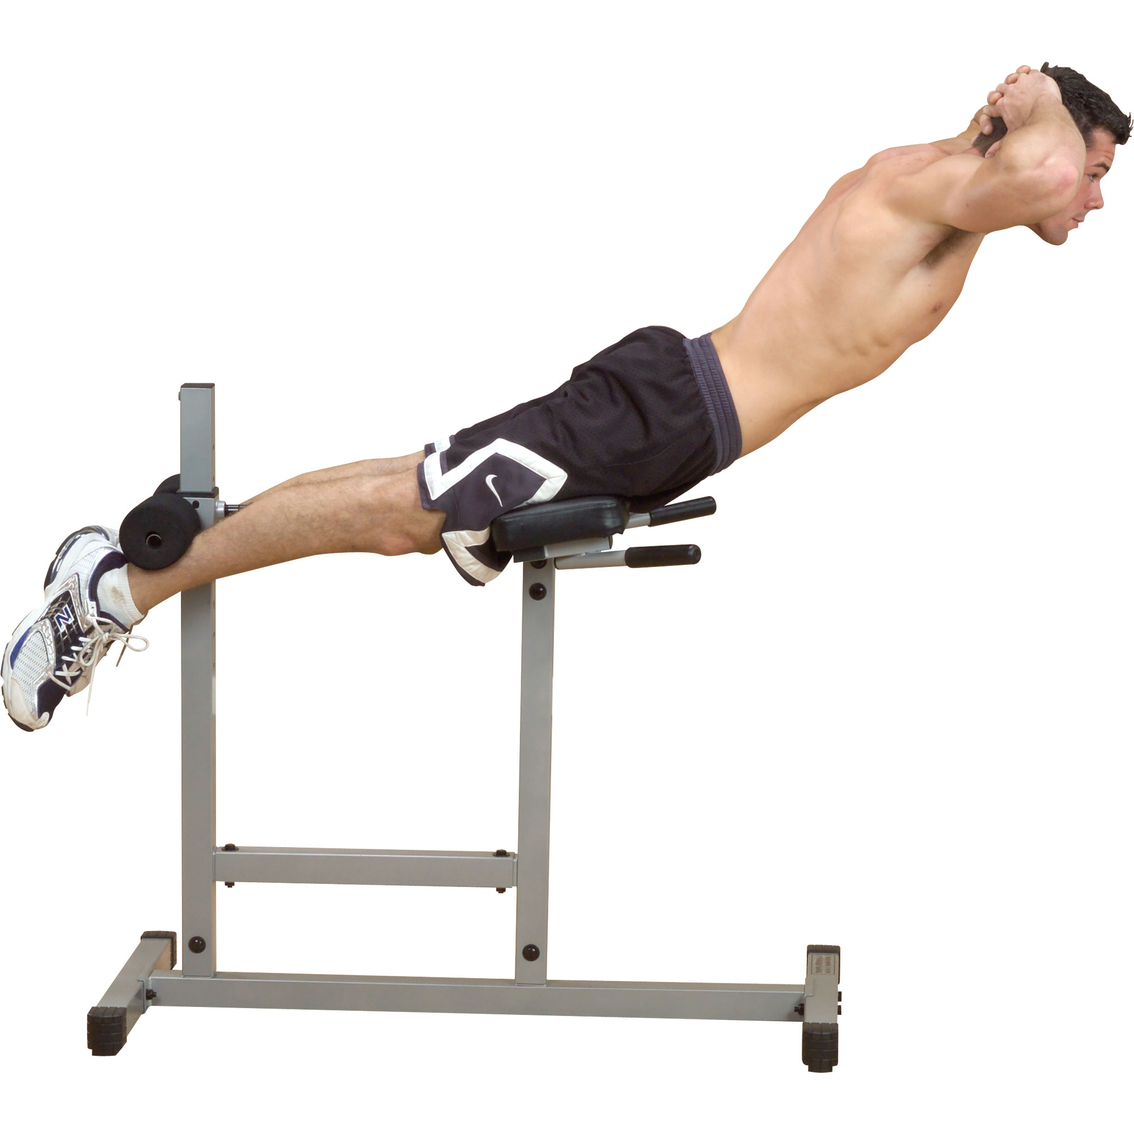 gym chair shop logo inc franklin tn body solid powerline roman strength training